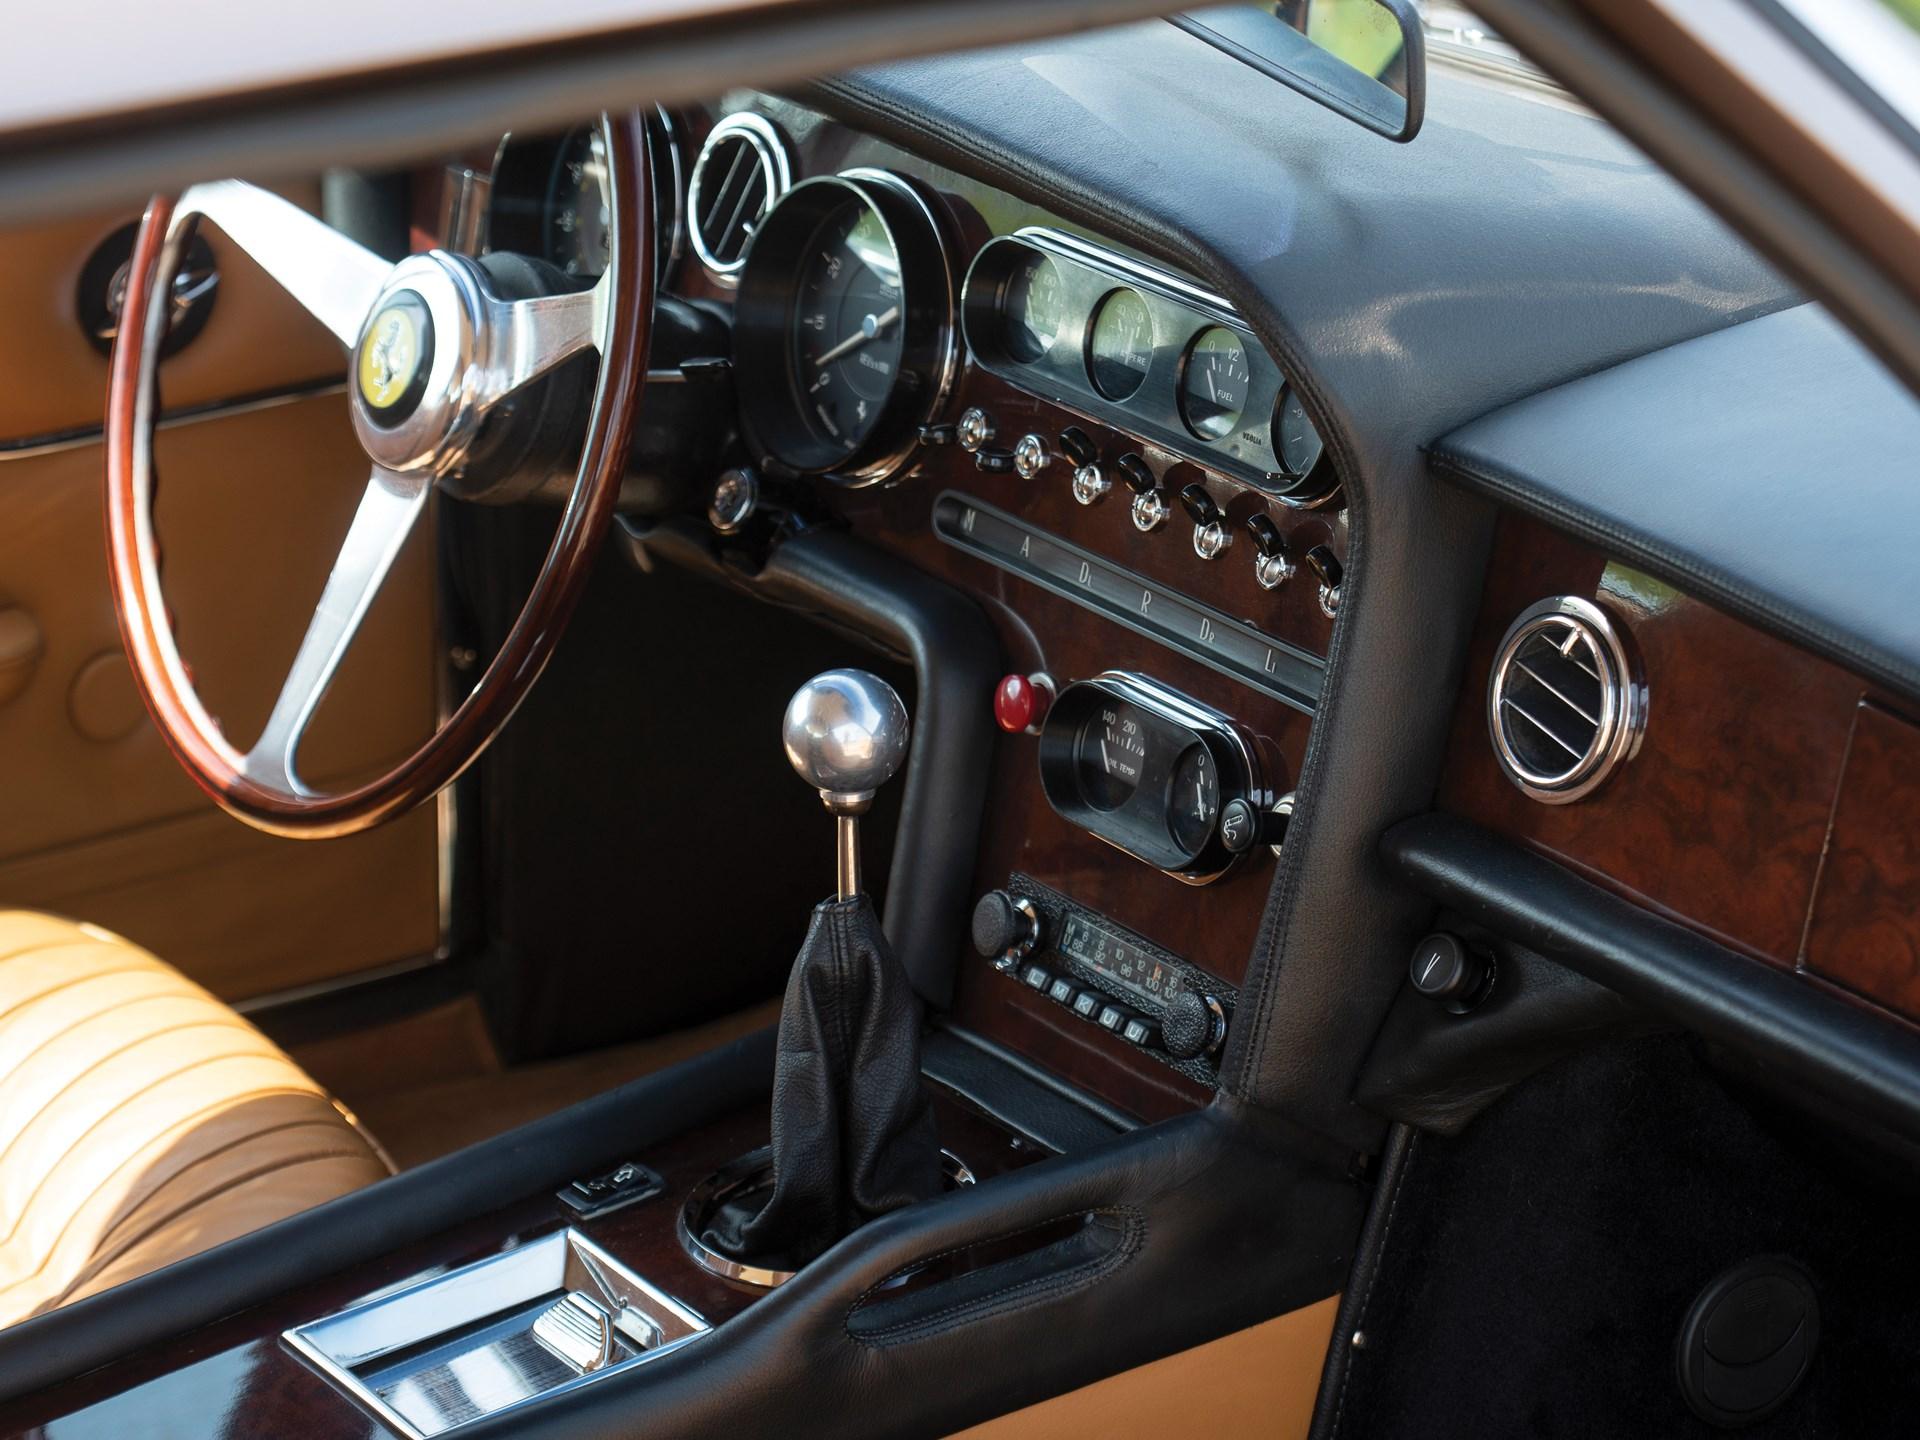 1965 Ferrari 330 GT 2+2 Shooting Brake gear shift